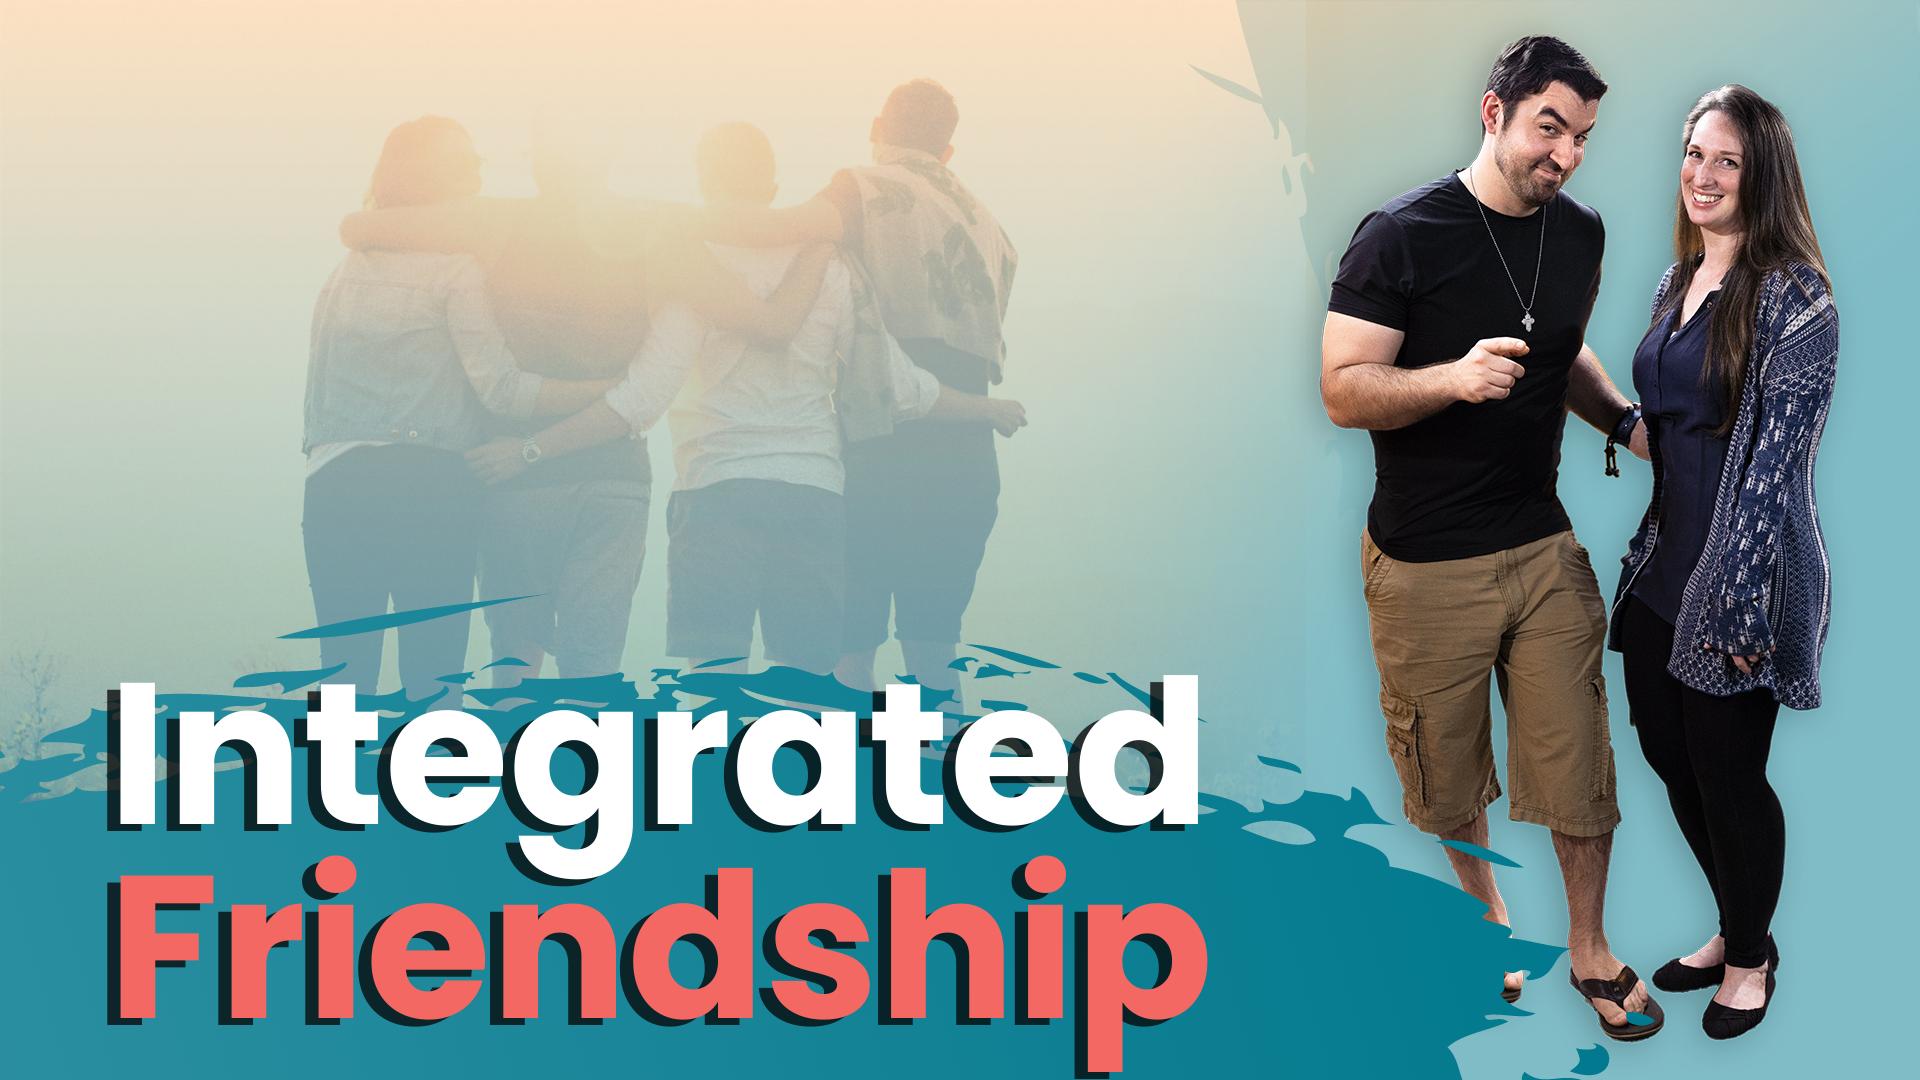 """Friendship - LOVE, COMMUNITY, PILGRIMAGE, CRISIS"" -Season 2- Ep29 Elevate Ordinary"